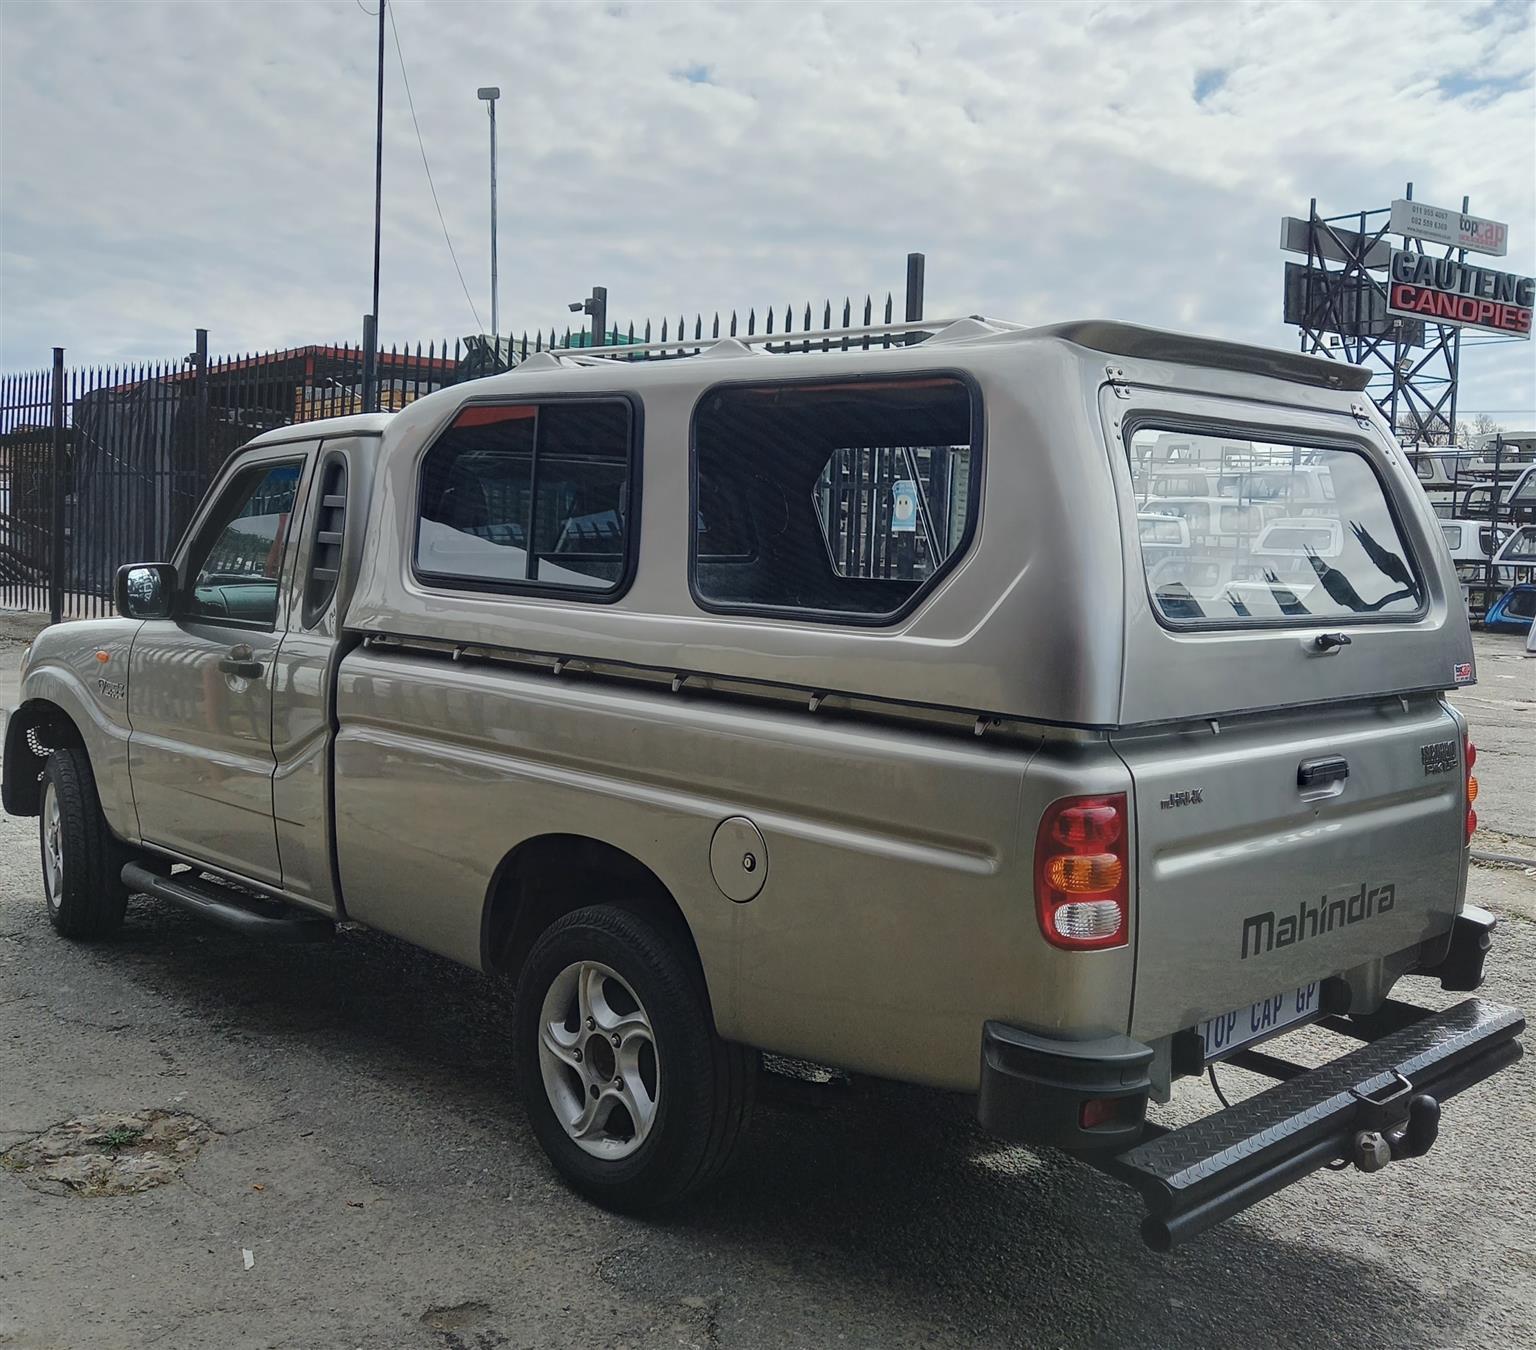 NEW MAHINDRA SCORPIO SINGLE CAB CANOPY FOR SALE